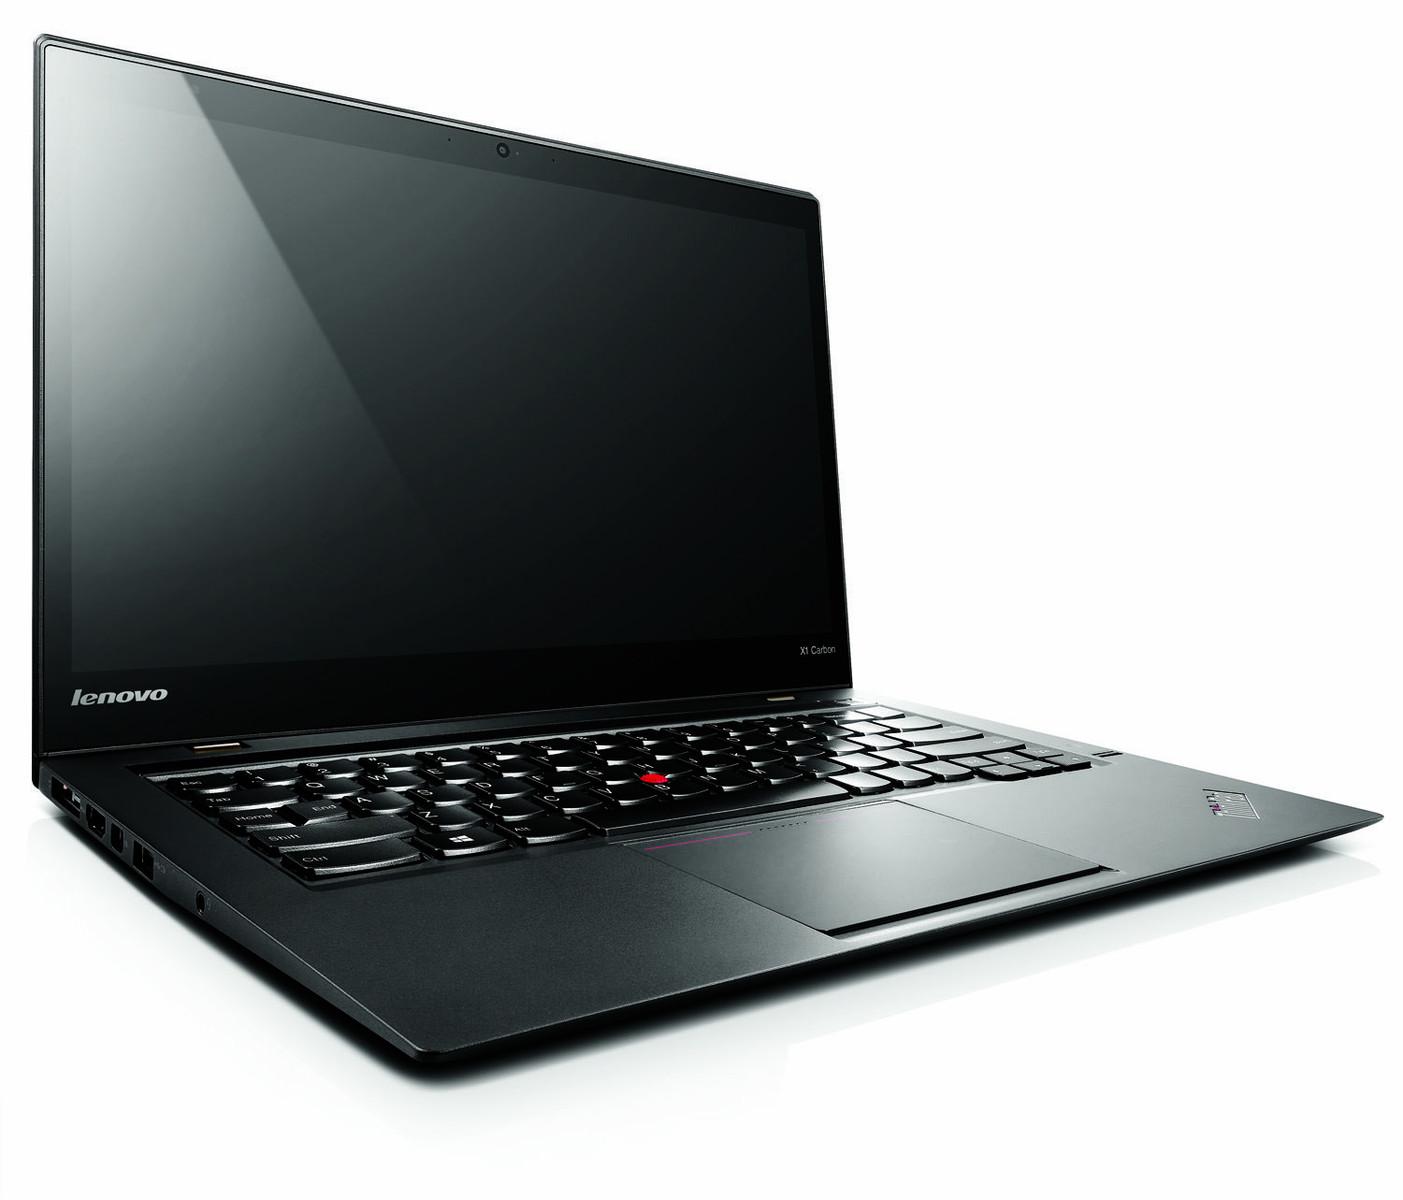 "Ультрабук Lenovo ThinkPad Ультрабук Lenovo ThinkPad X1 Carbon 5 14"" 1920x1080 Intel Core i7-7500U SSD 256 8Gb Intel HD Graphics 620 черный Windows 10 Home 20HR005PRT"